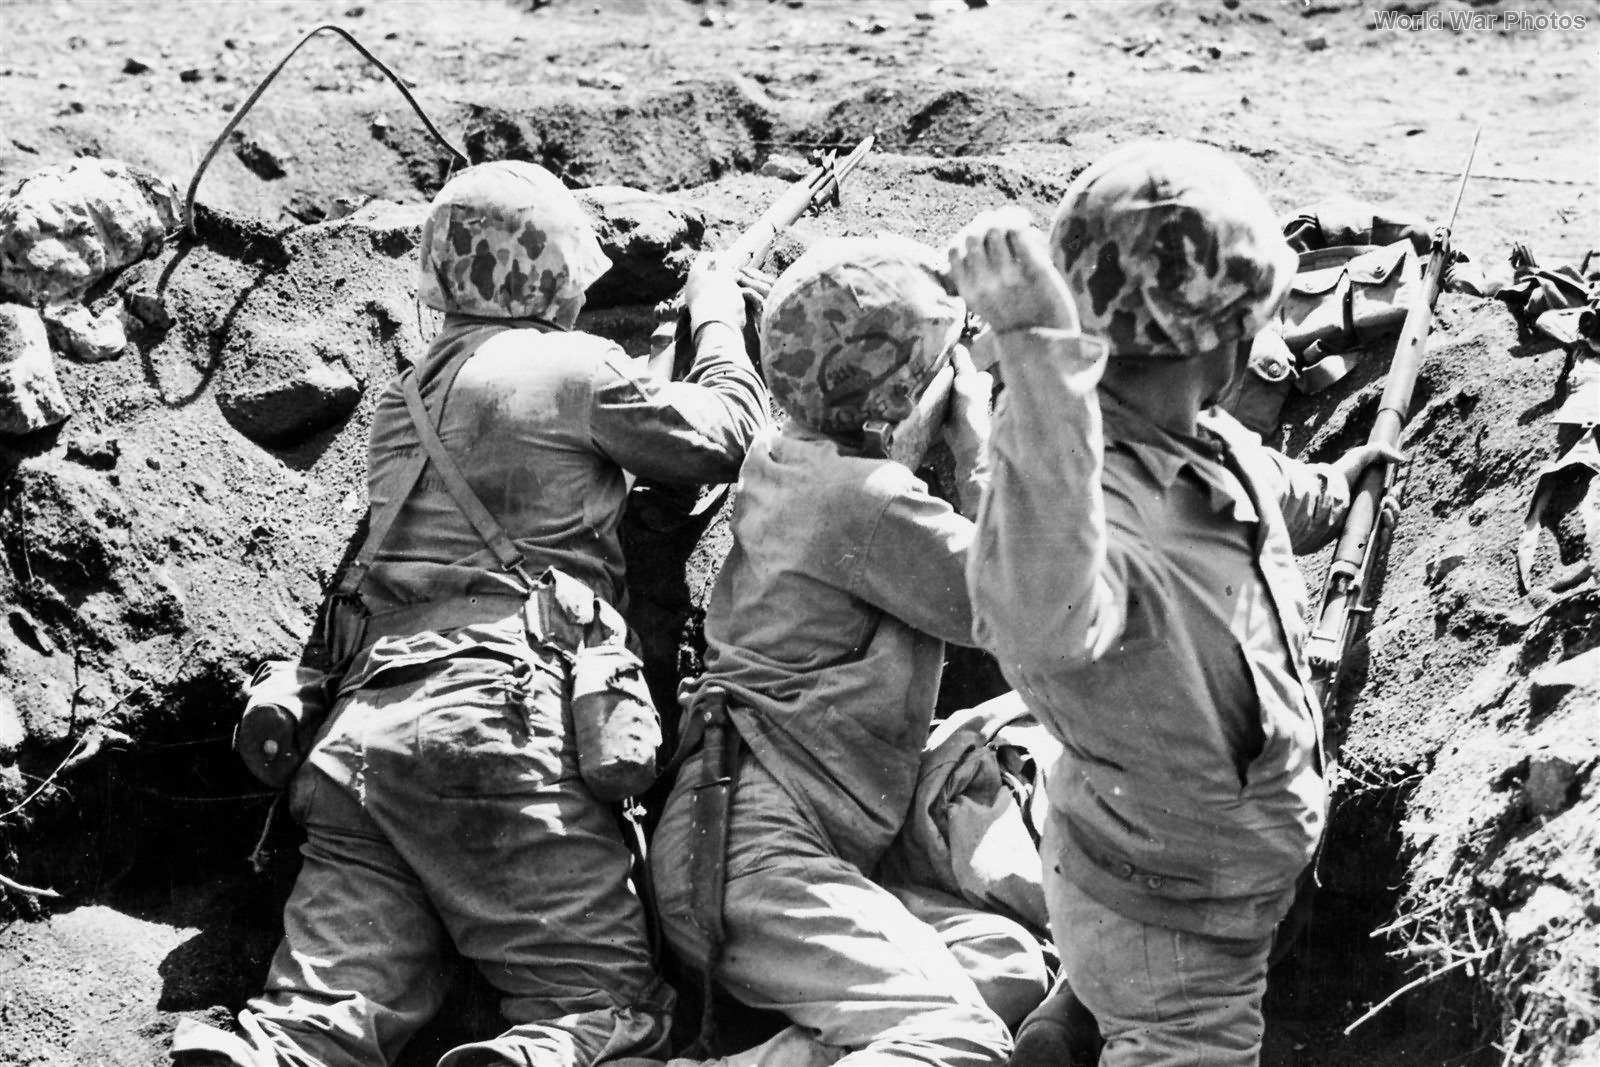 Marine Throws Grenade on Iwo Jima February 1945